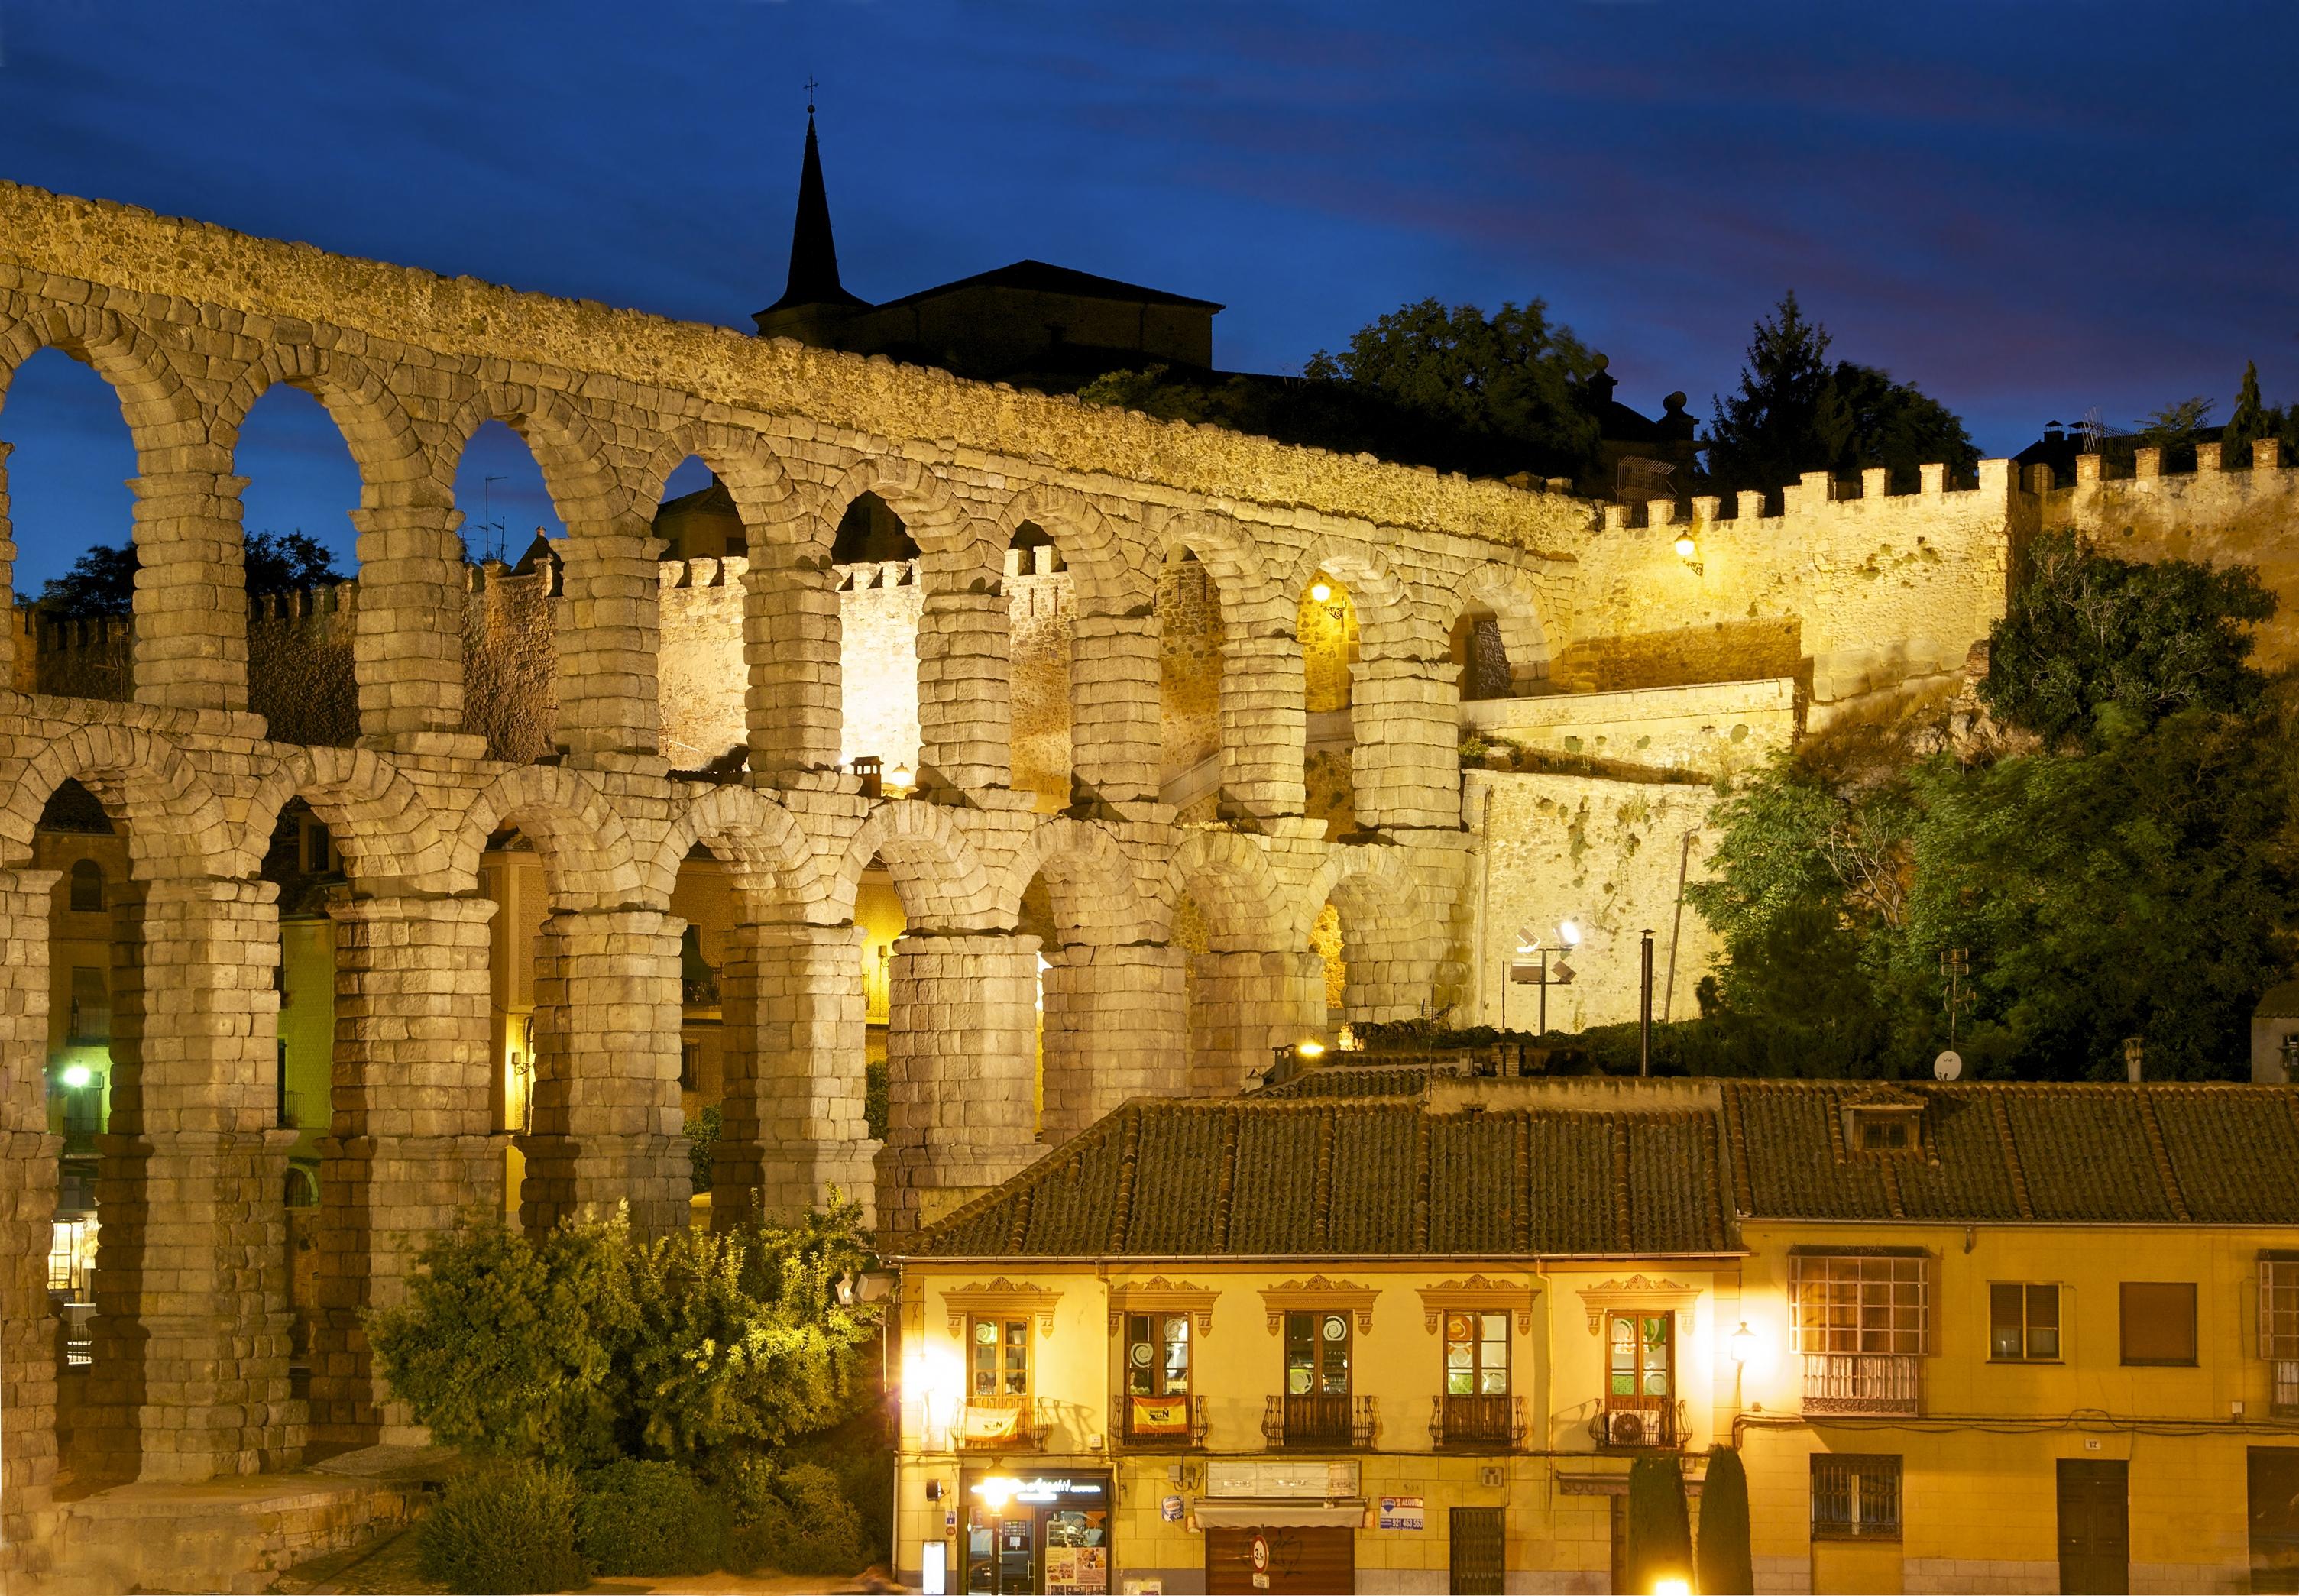 File:Aqueduct city wall Segovia night.jpg